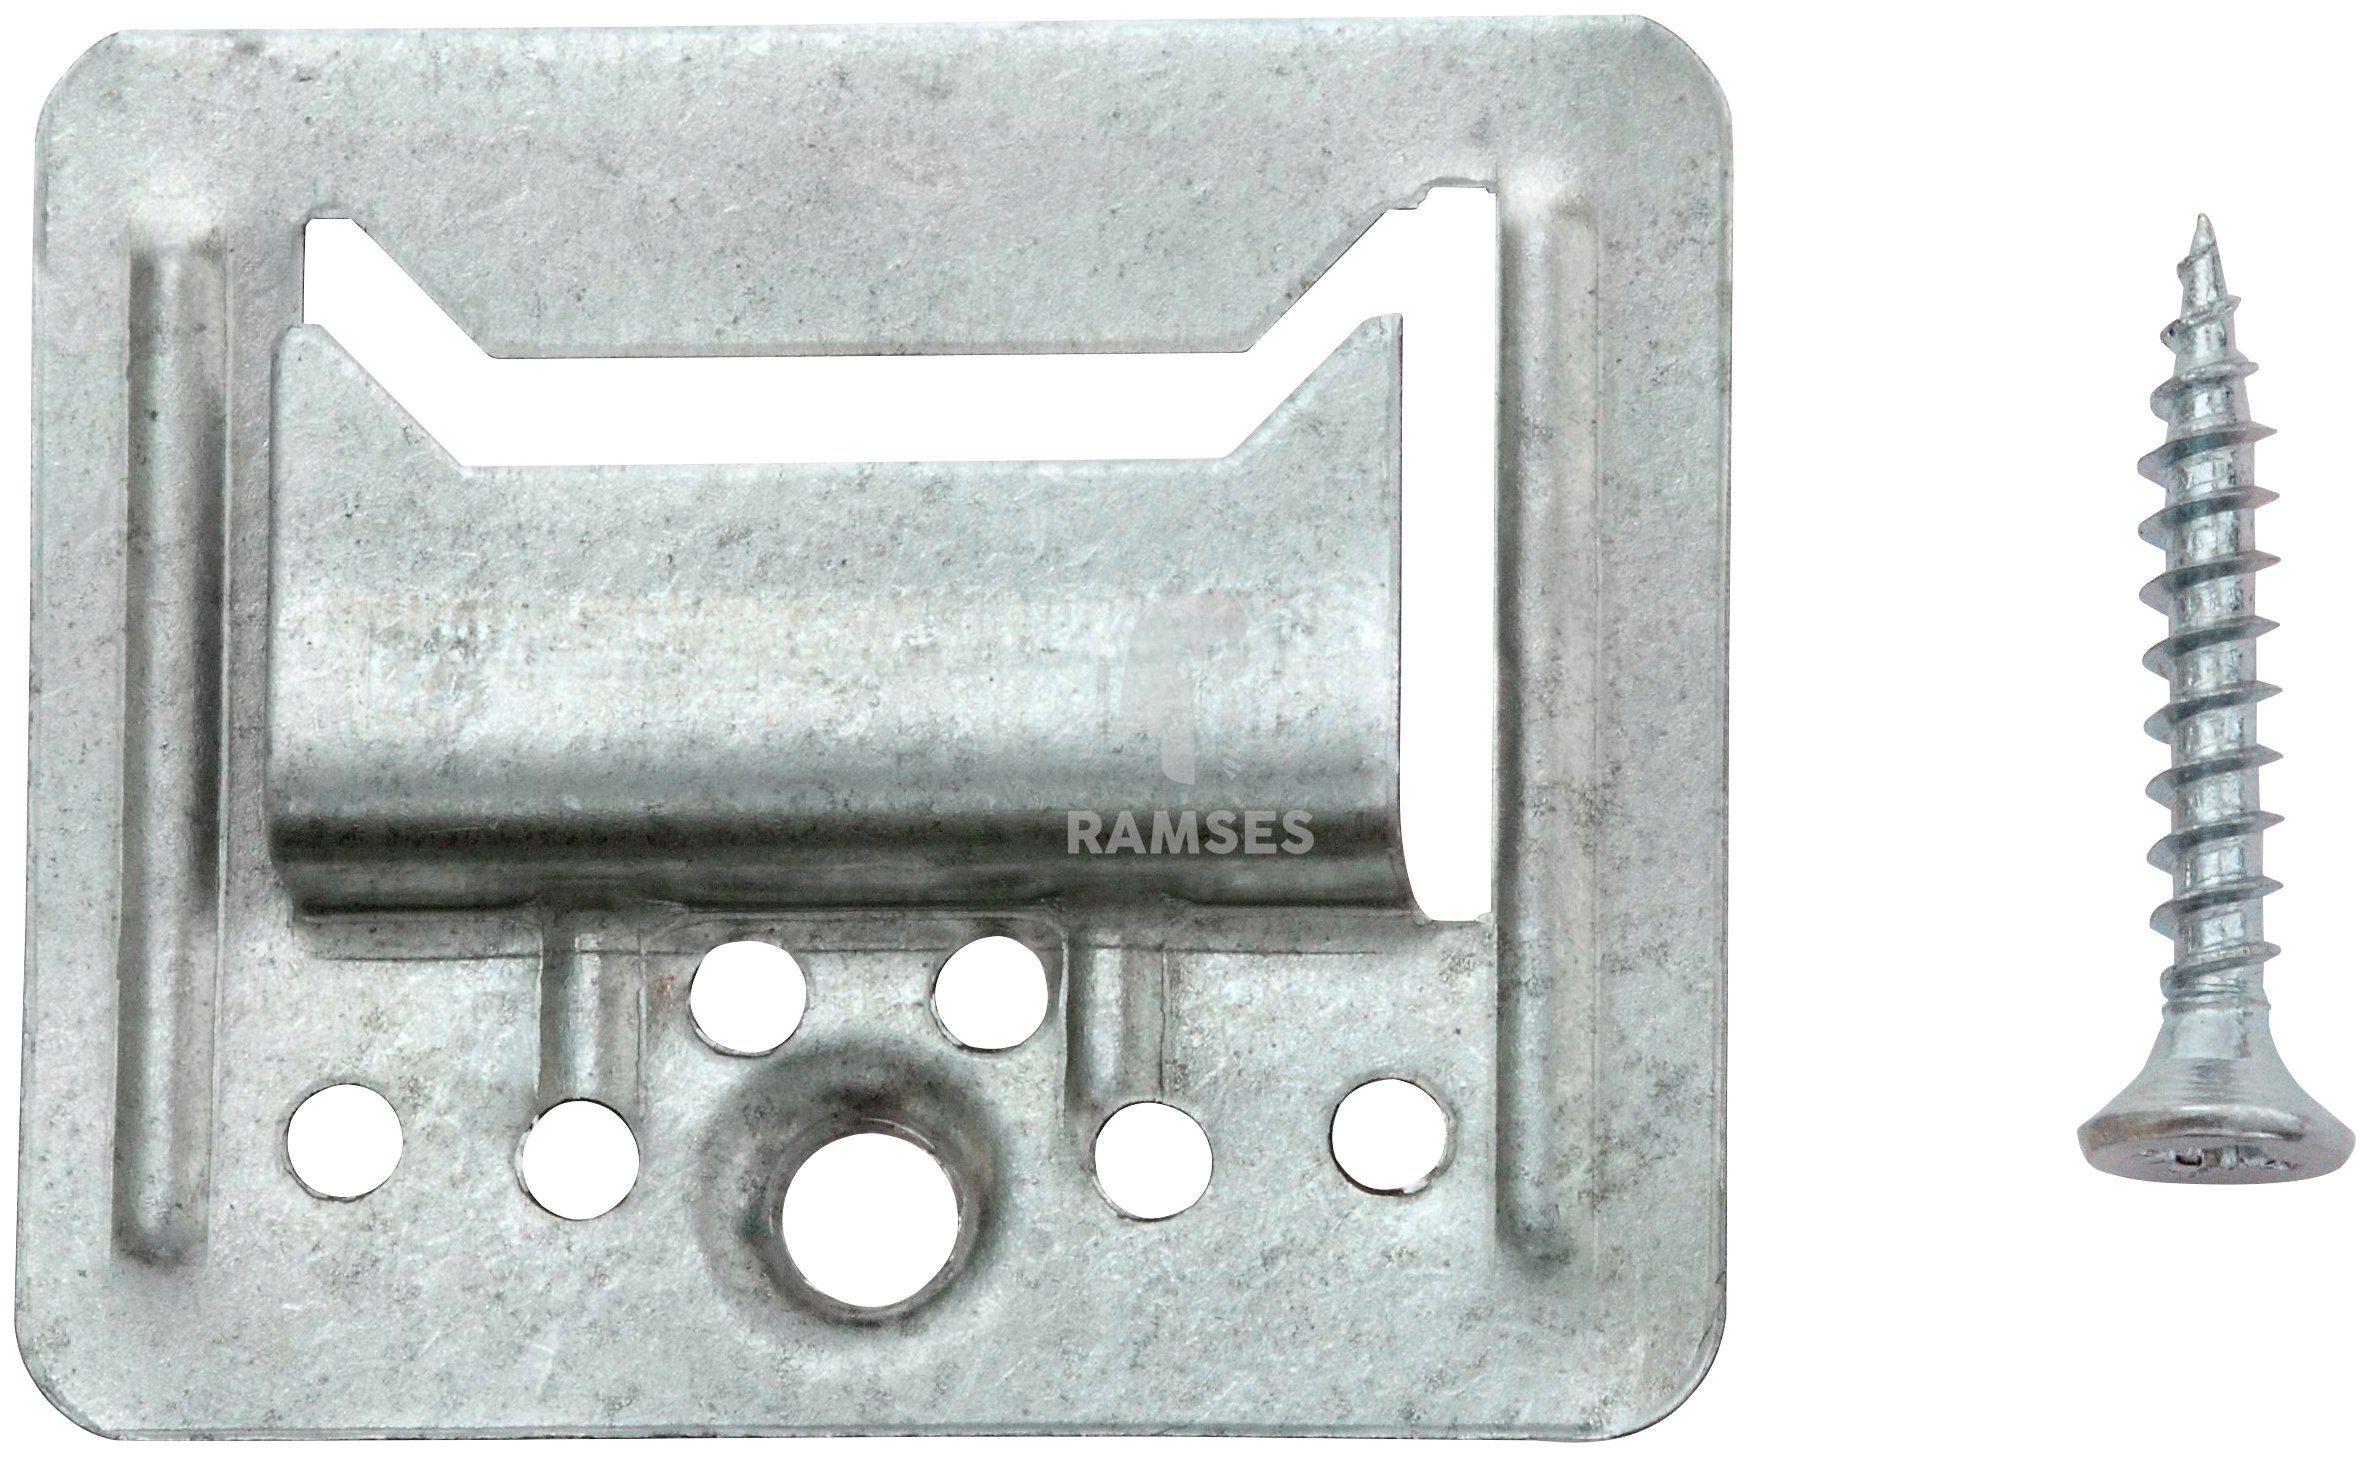 RAMSES Profilholzkrallen , extra stark inkl. Schrauben 4 mm Stahl verzinkt 100 Stück